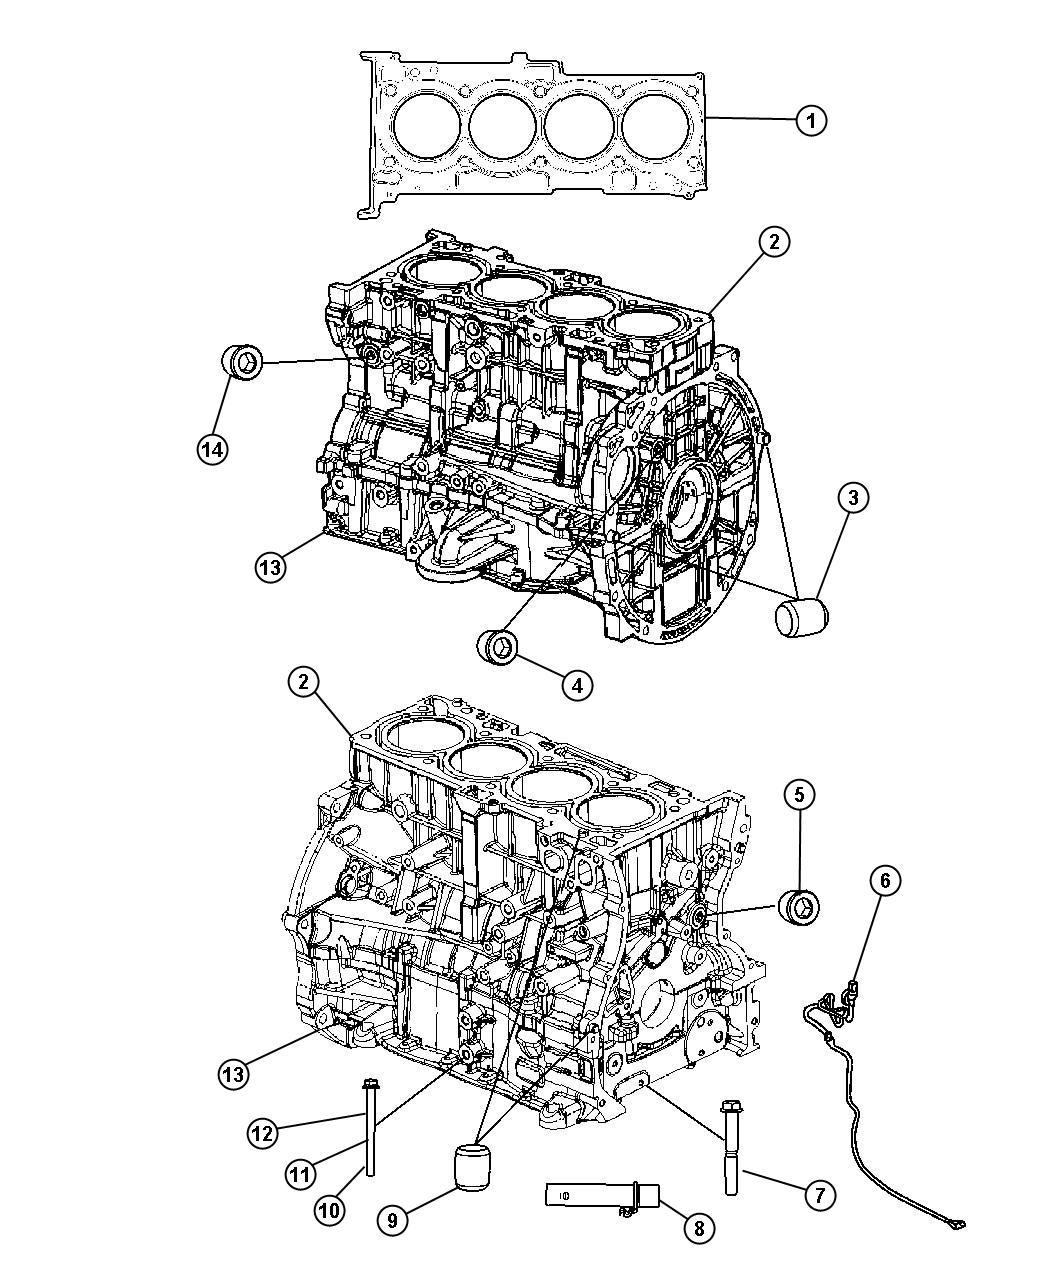 Jeep Patriot Engine Long Block Remanufactured